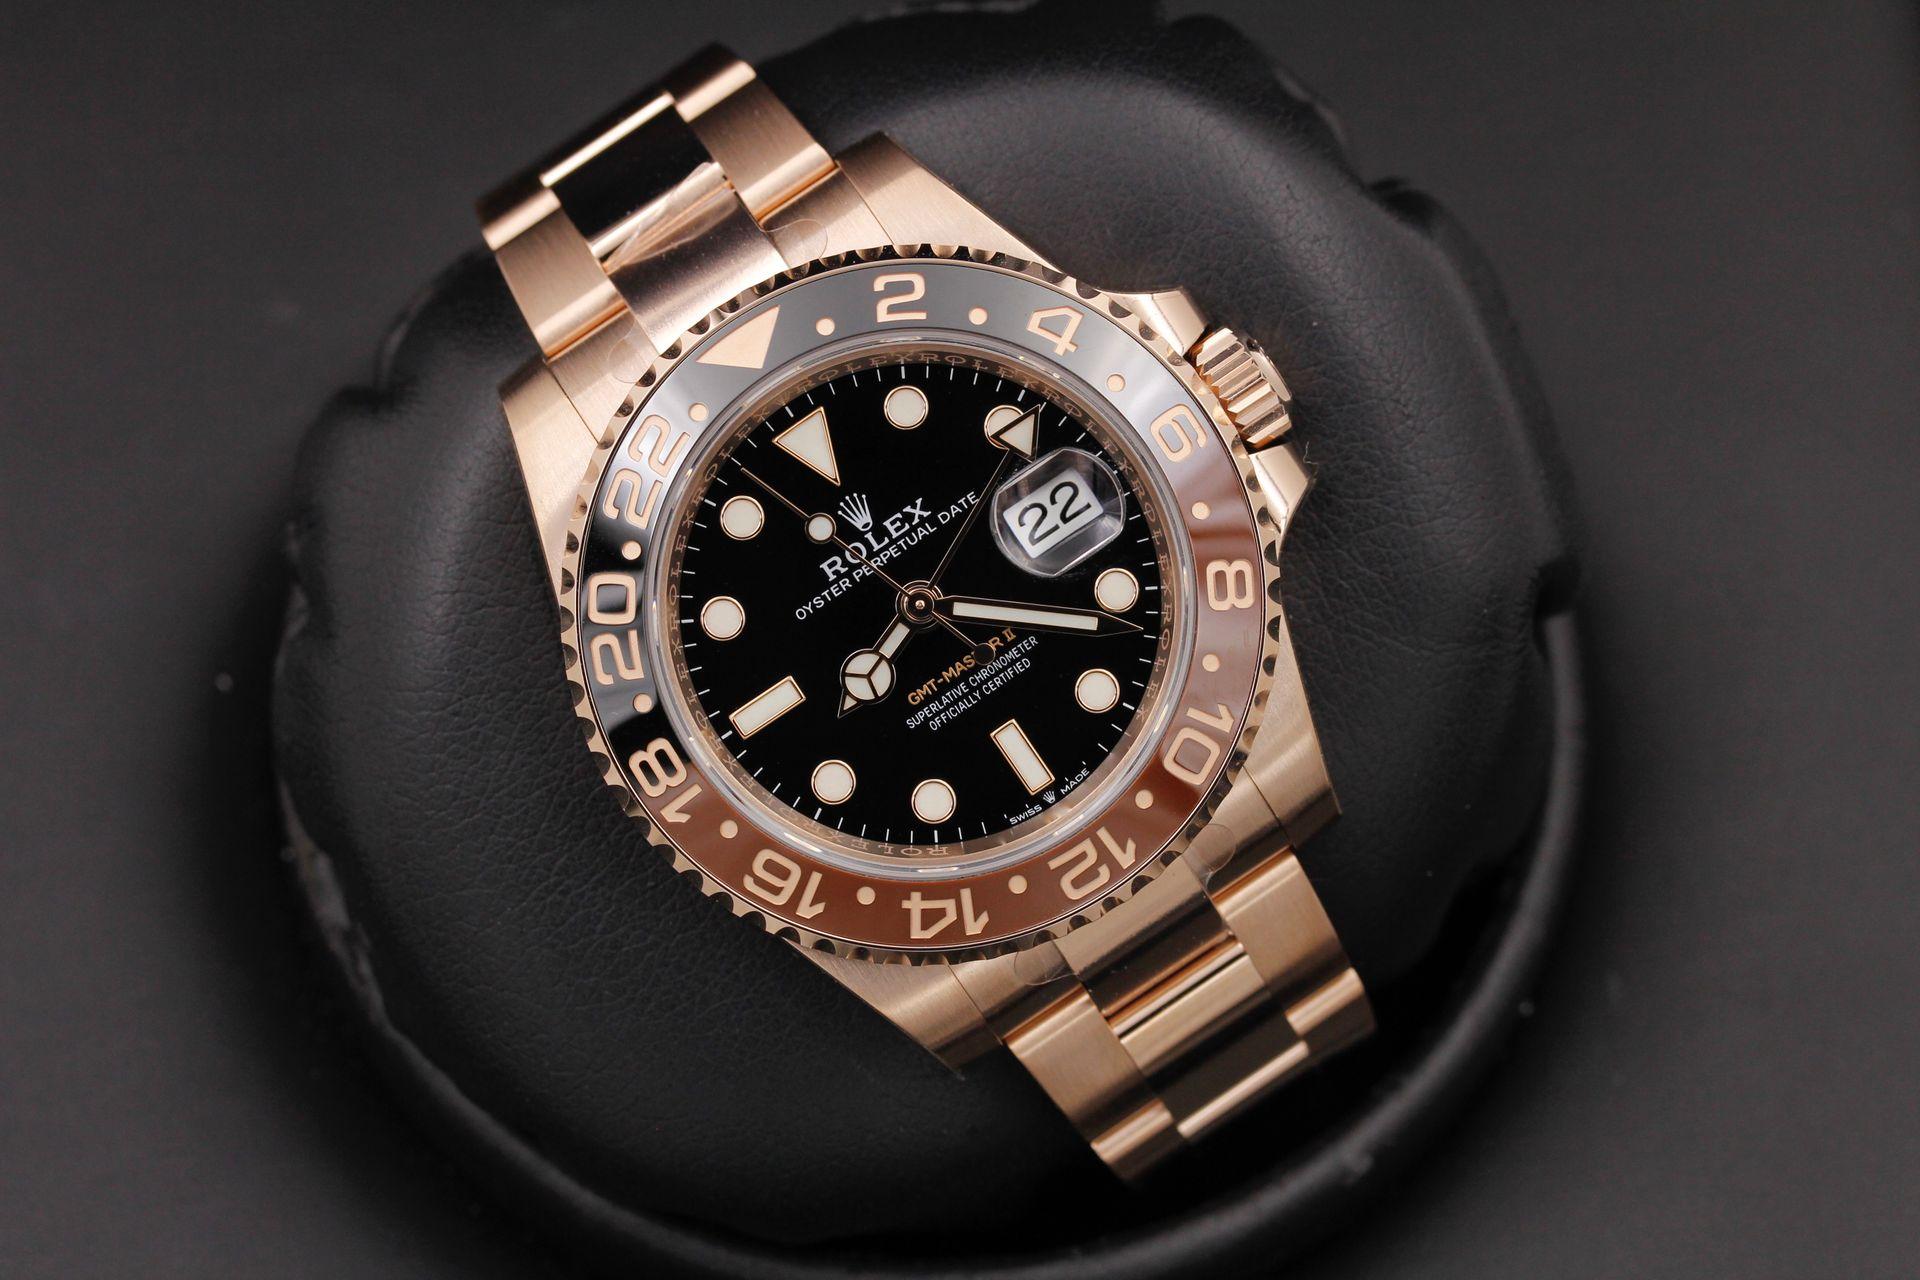 Rolex Gmt Master Ii 126715 Rose Gold - OCWatchGuy